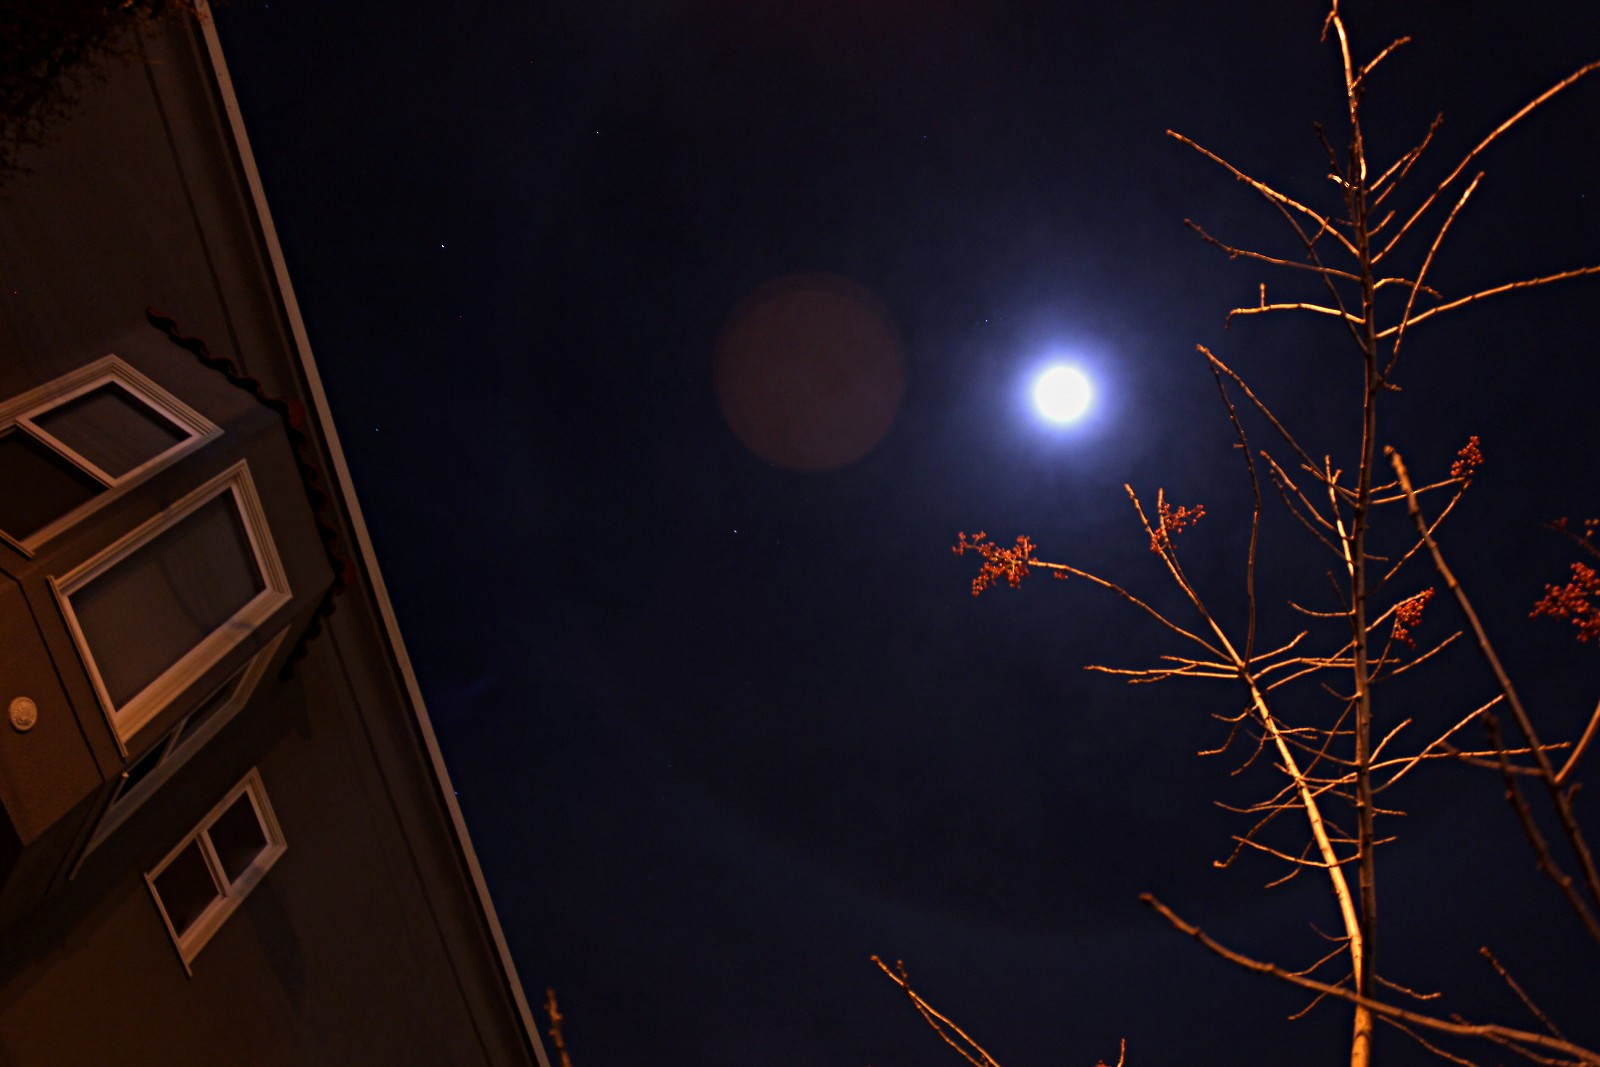 SNAPS__ moon halo